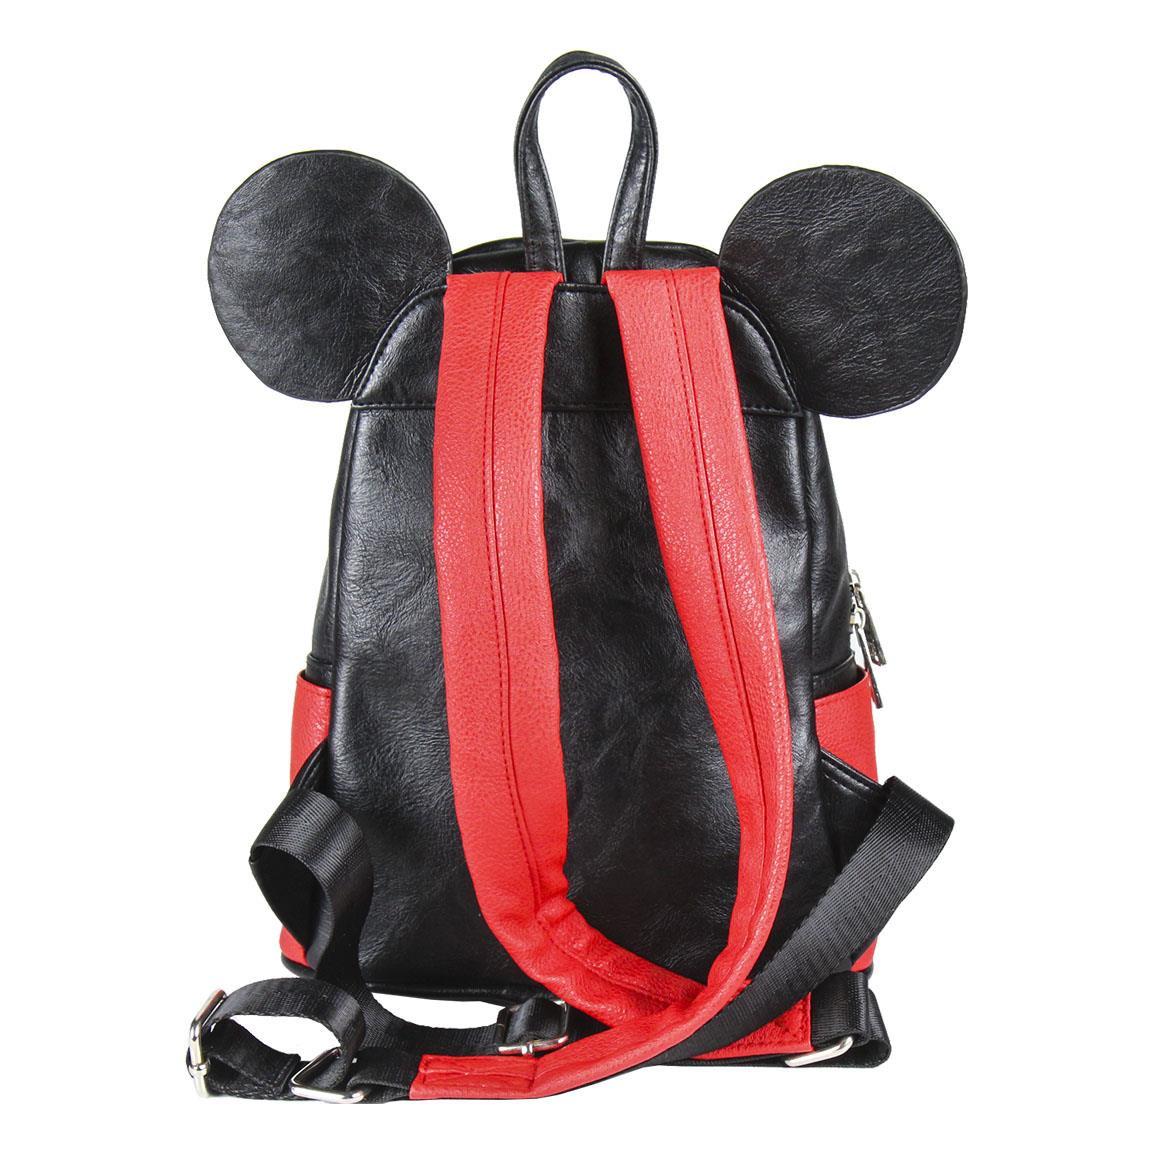 Mochila escolar Premium 48cm c trolley de Mickey Oh Boy